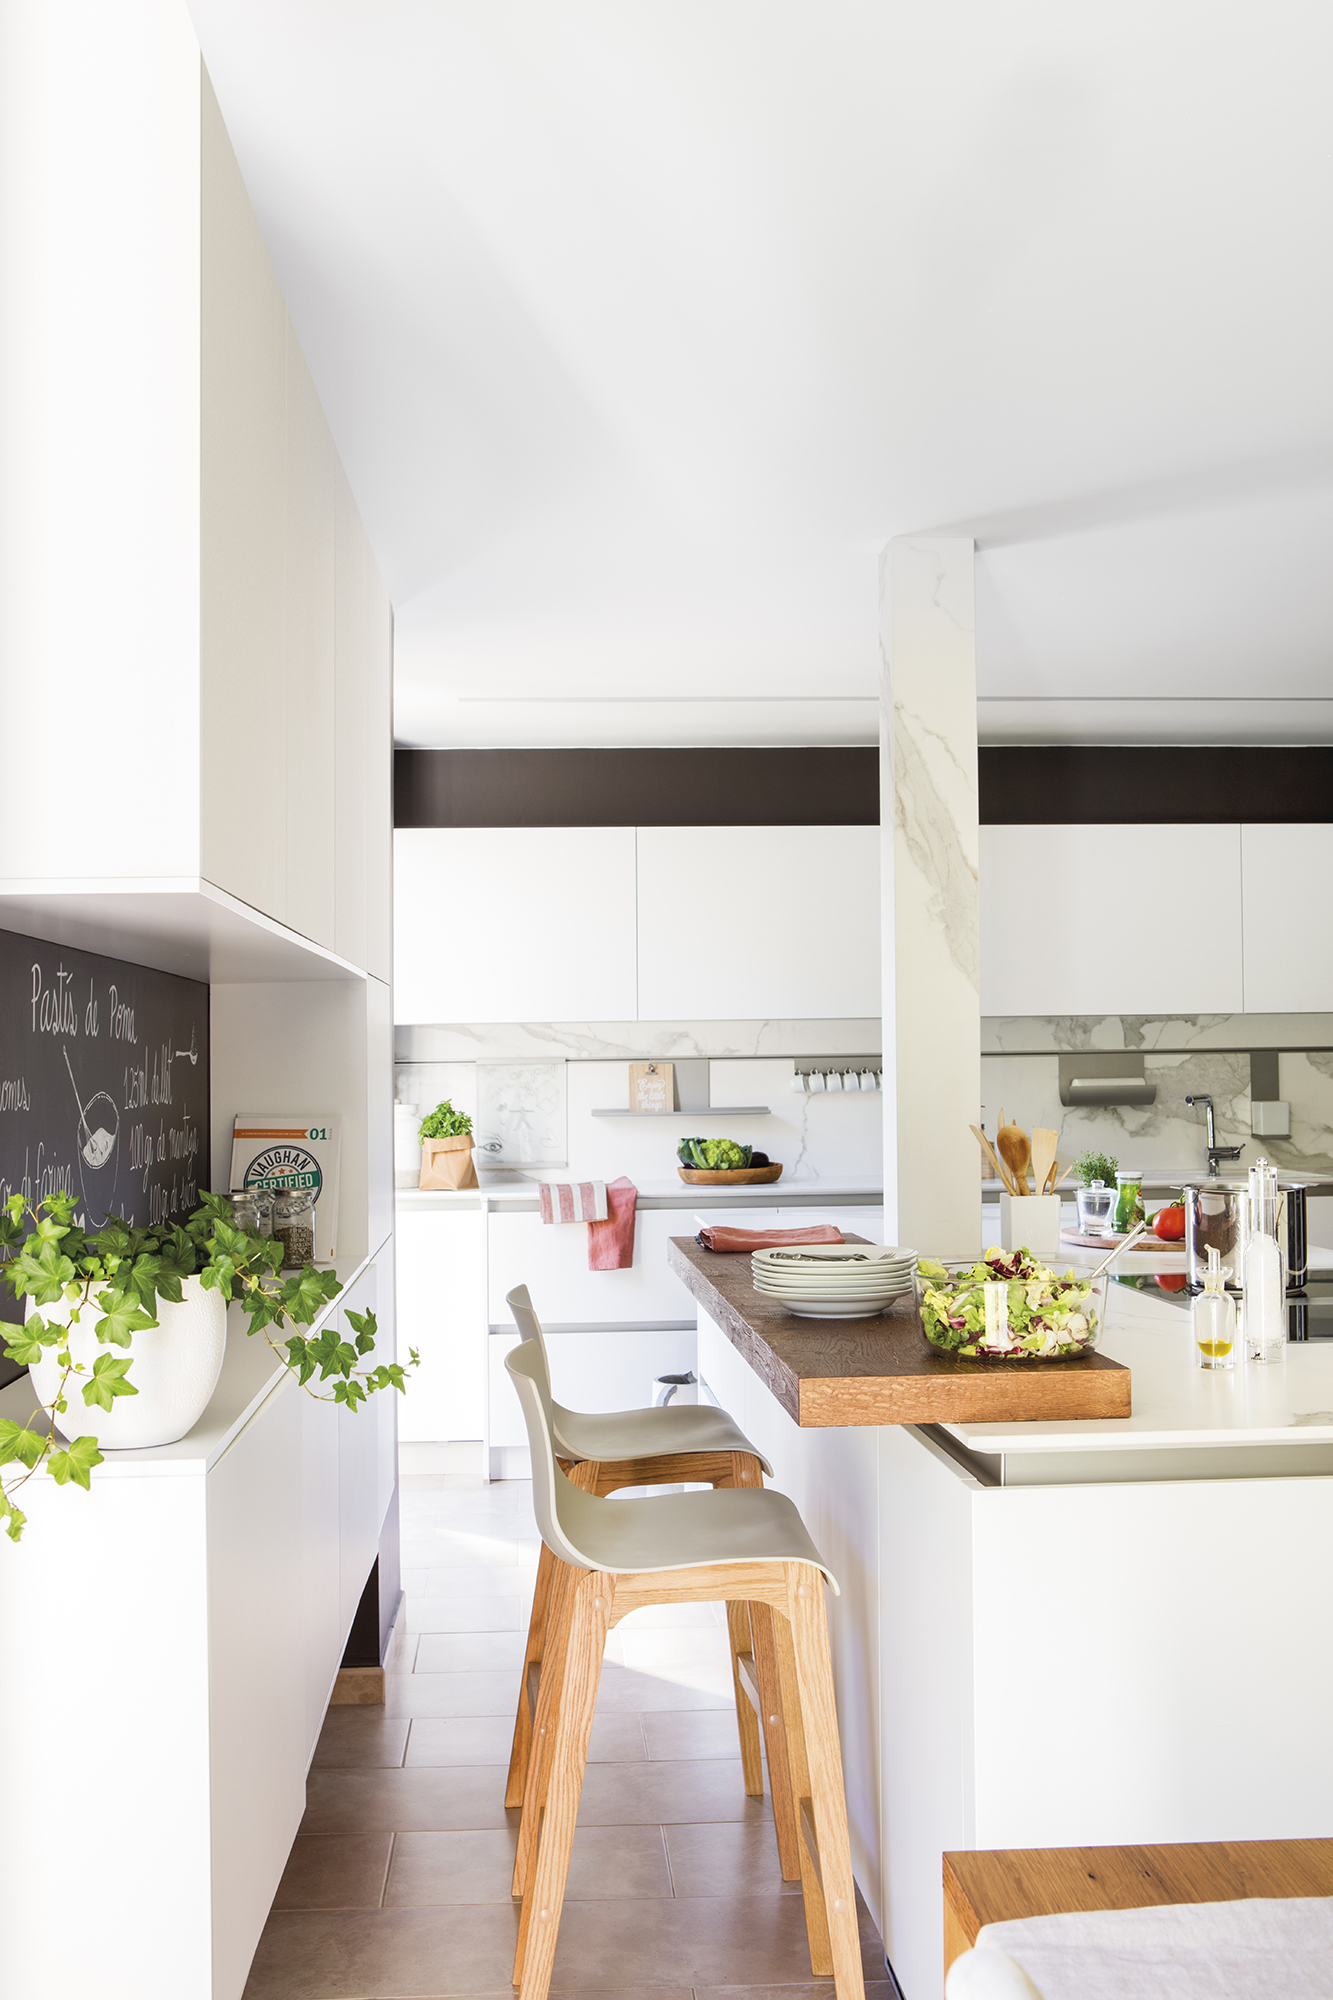 Cocinas muebles decoraci n dise o blancas o peque as - Taburetes de cocina de madera ...